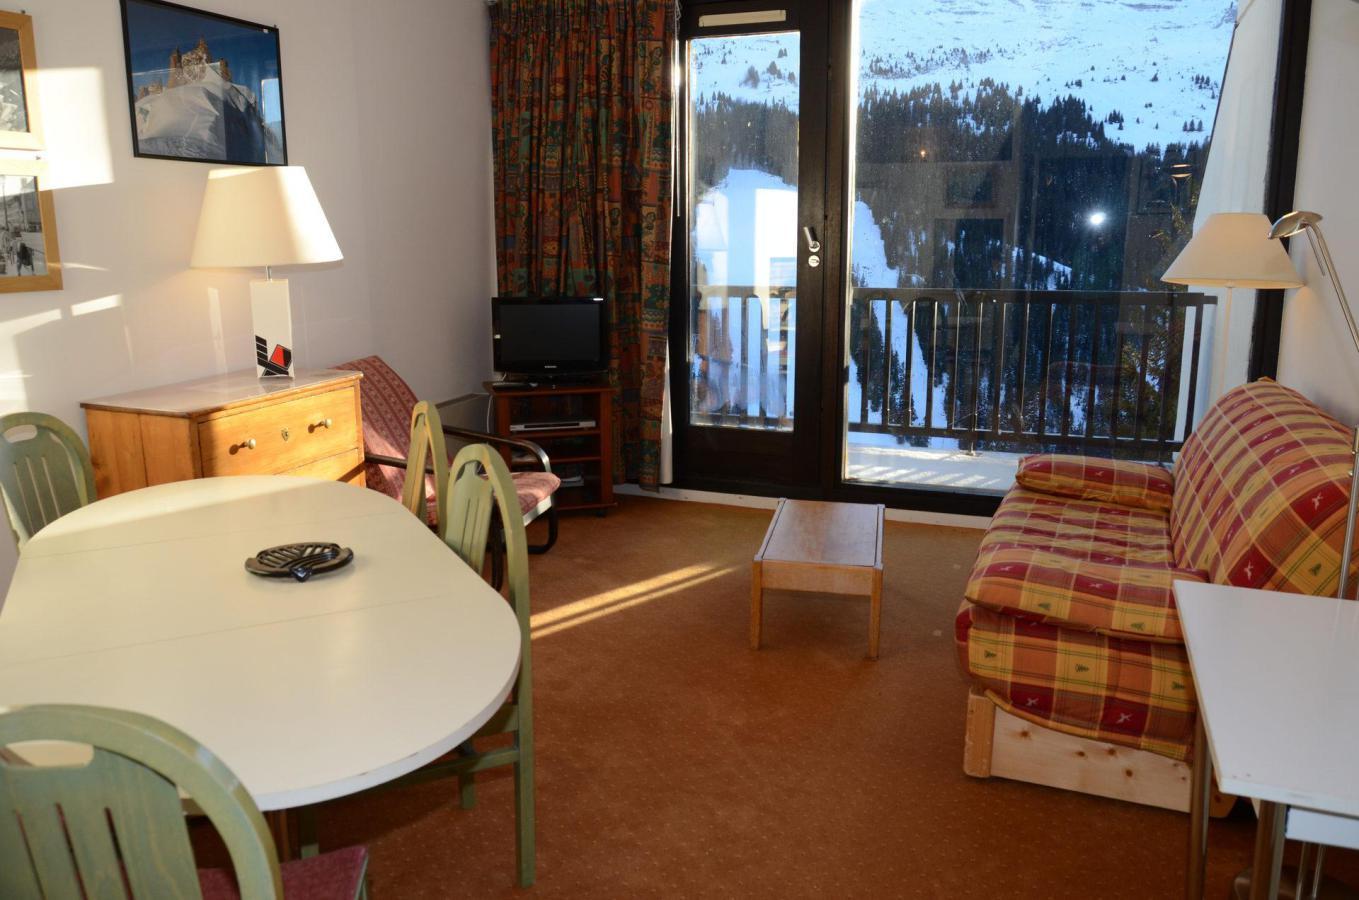 Location au ski Appartement 2 pièces 6 personnes (A2) - Residence Balance - Flaine - Coin repas